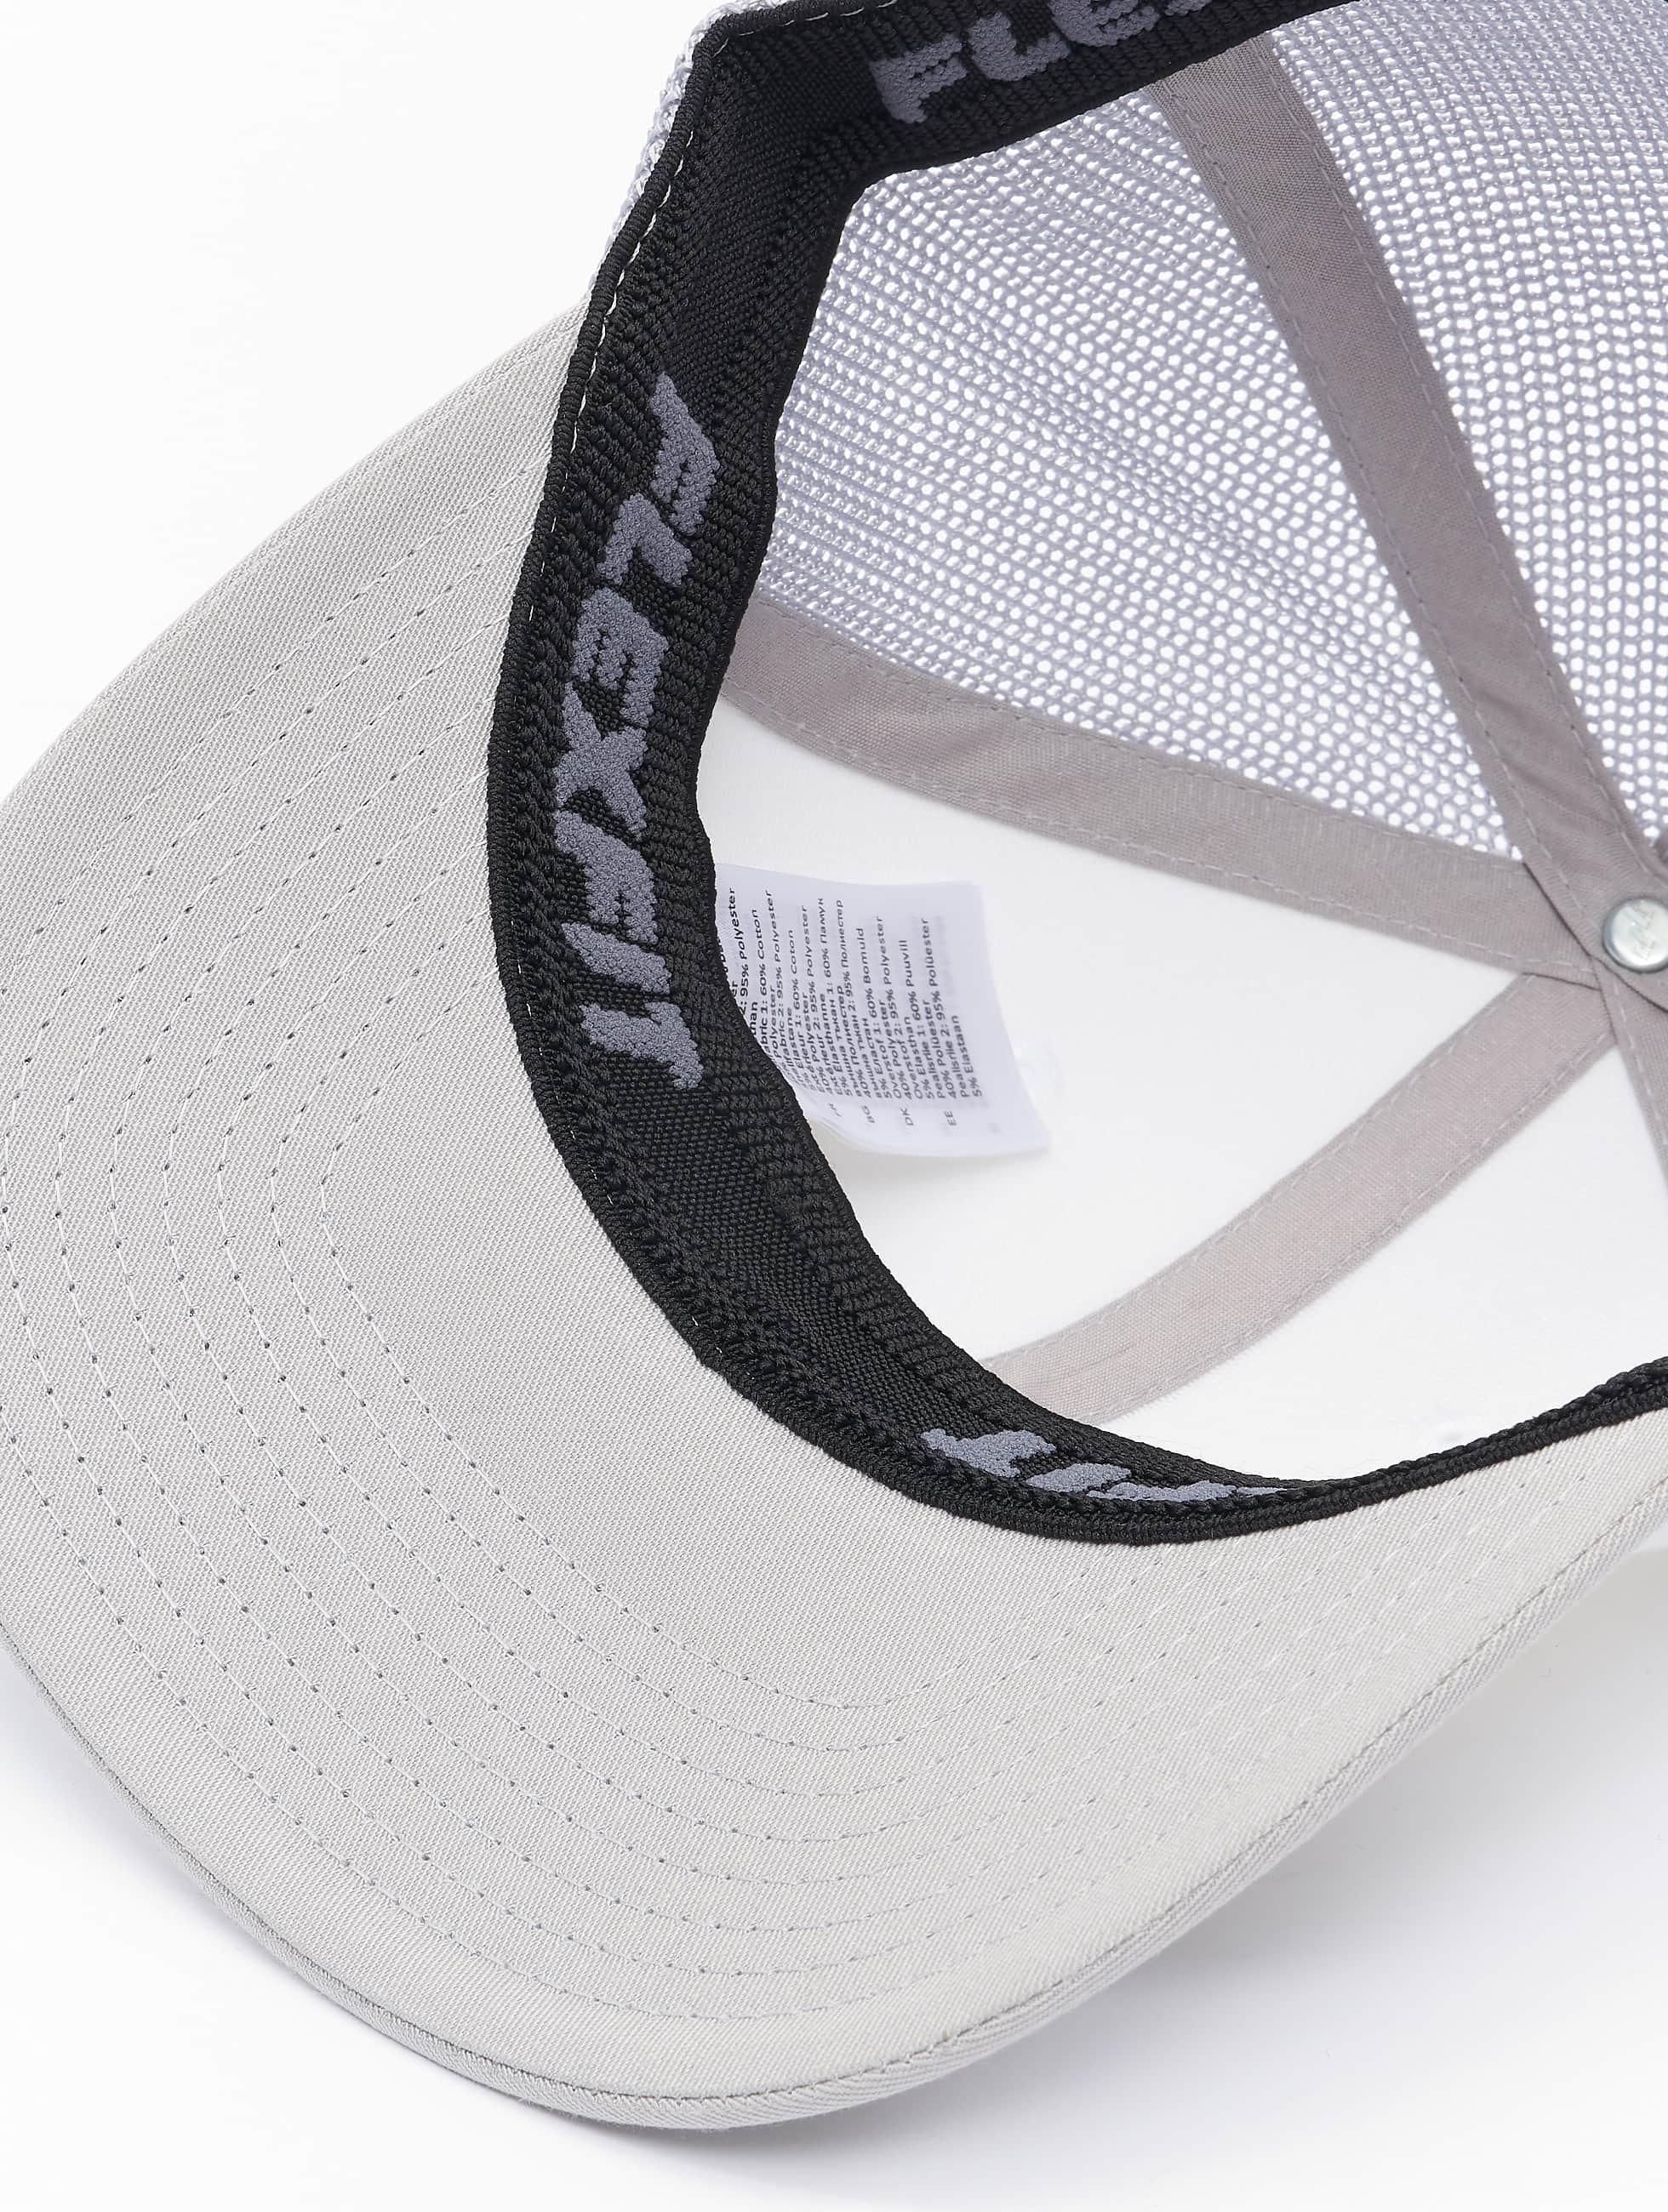 Flexfit Flexfitted Cap Mesh Colored Front silberfarben